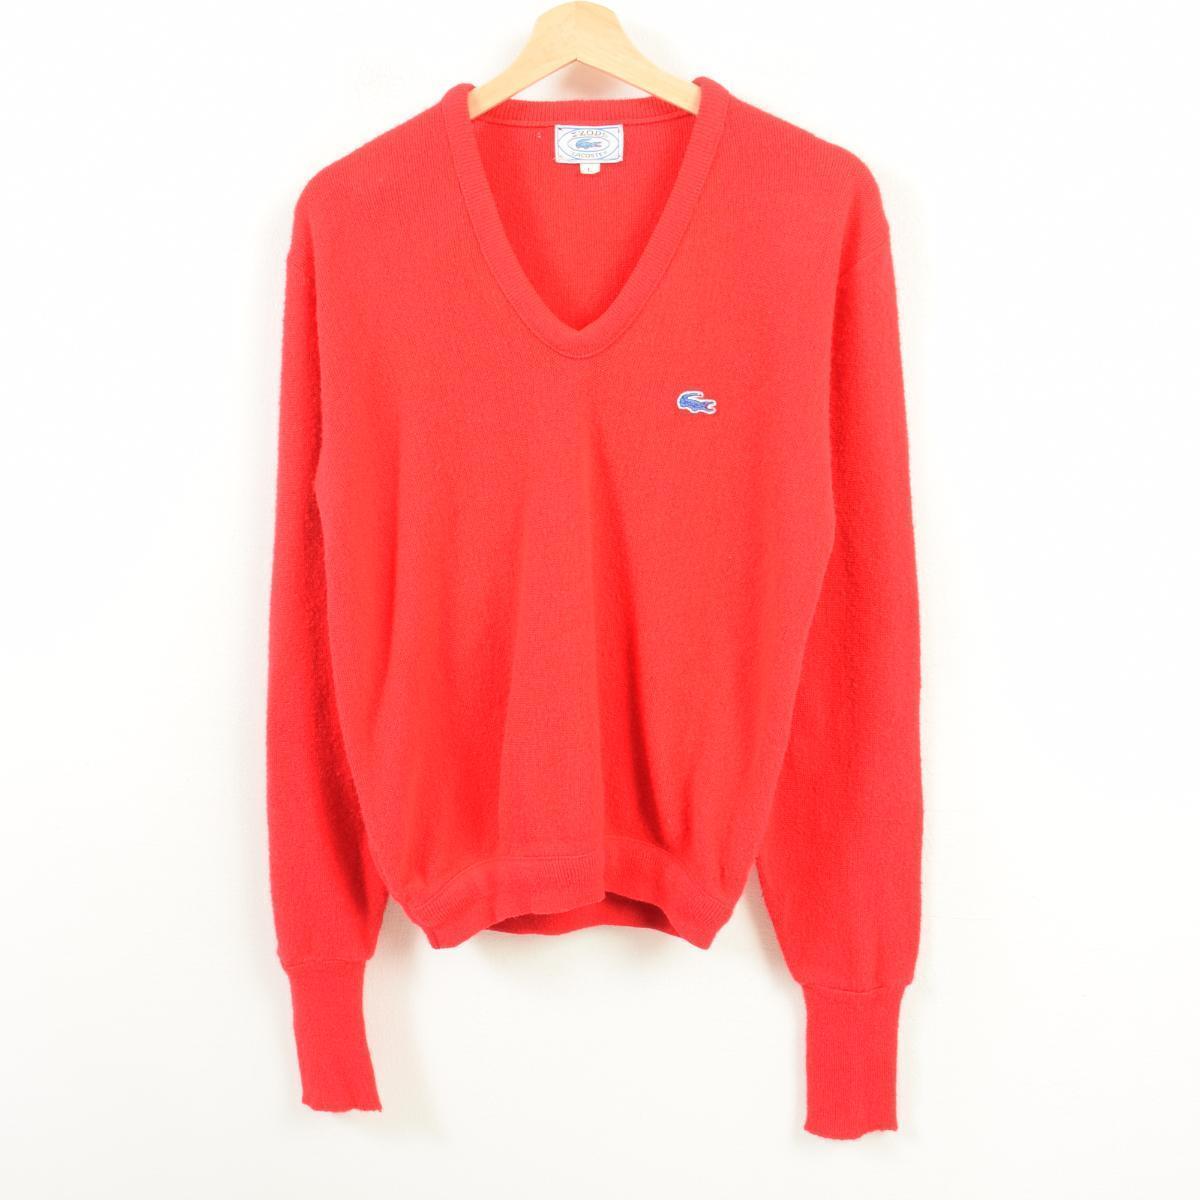 7d87aa715d32bb 70-80 generation Lacoste LACOSTE IZOD V neck acrylic knit sweater men M  vintage  wav4531